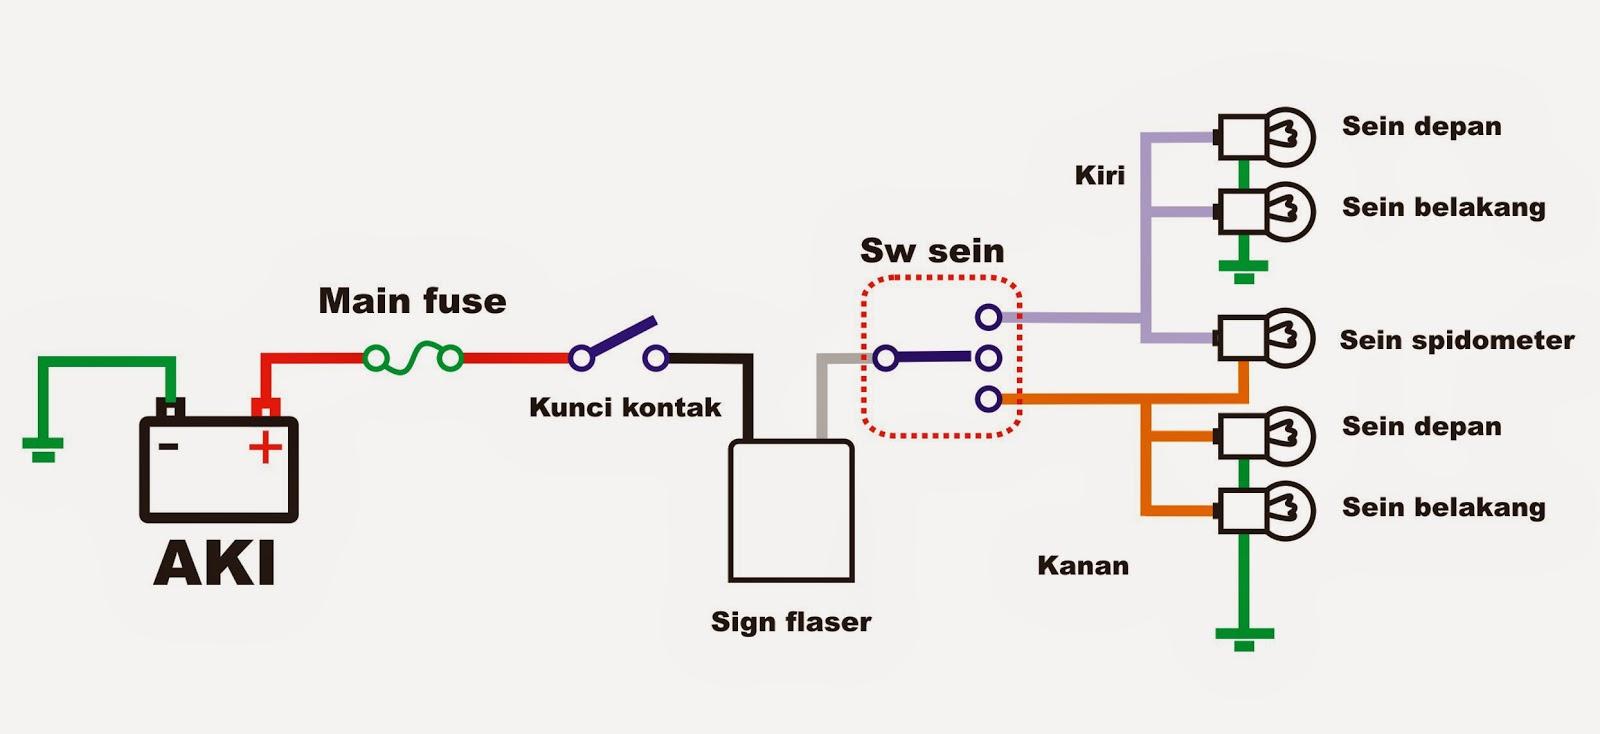 Sistem       Kelistrikan    Sepeda Motor   Otomotif Mekanik Motor